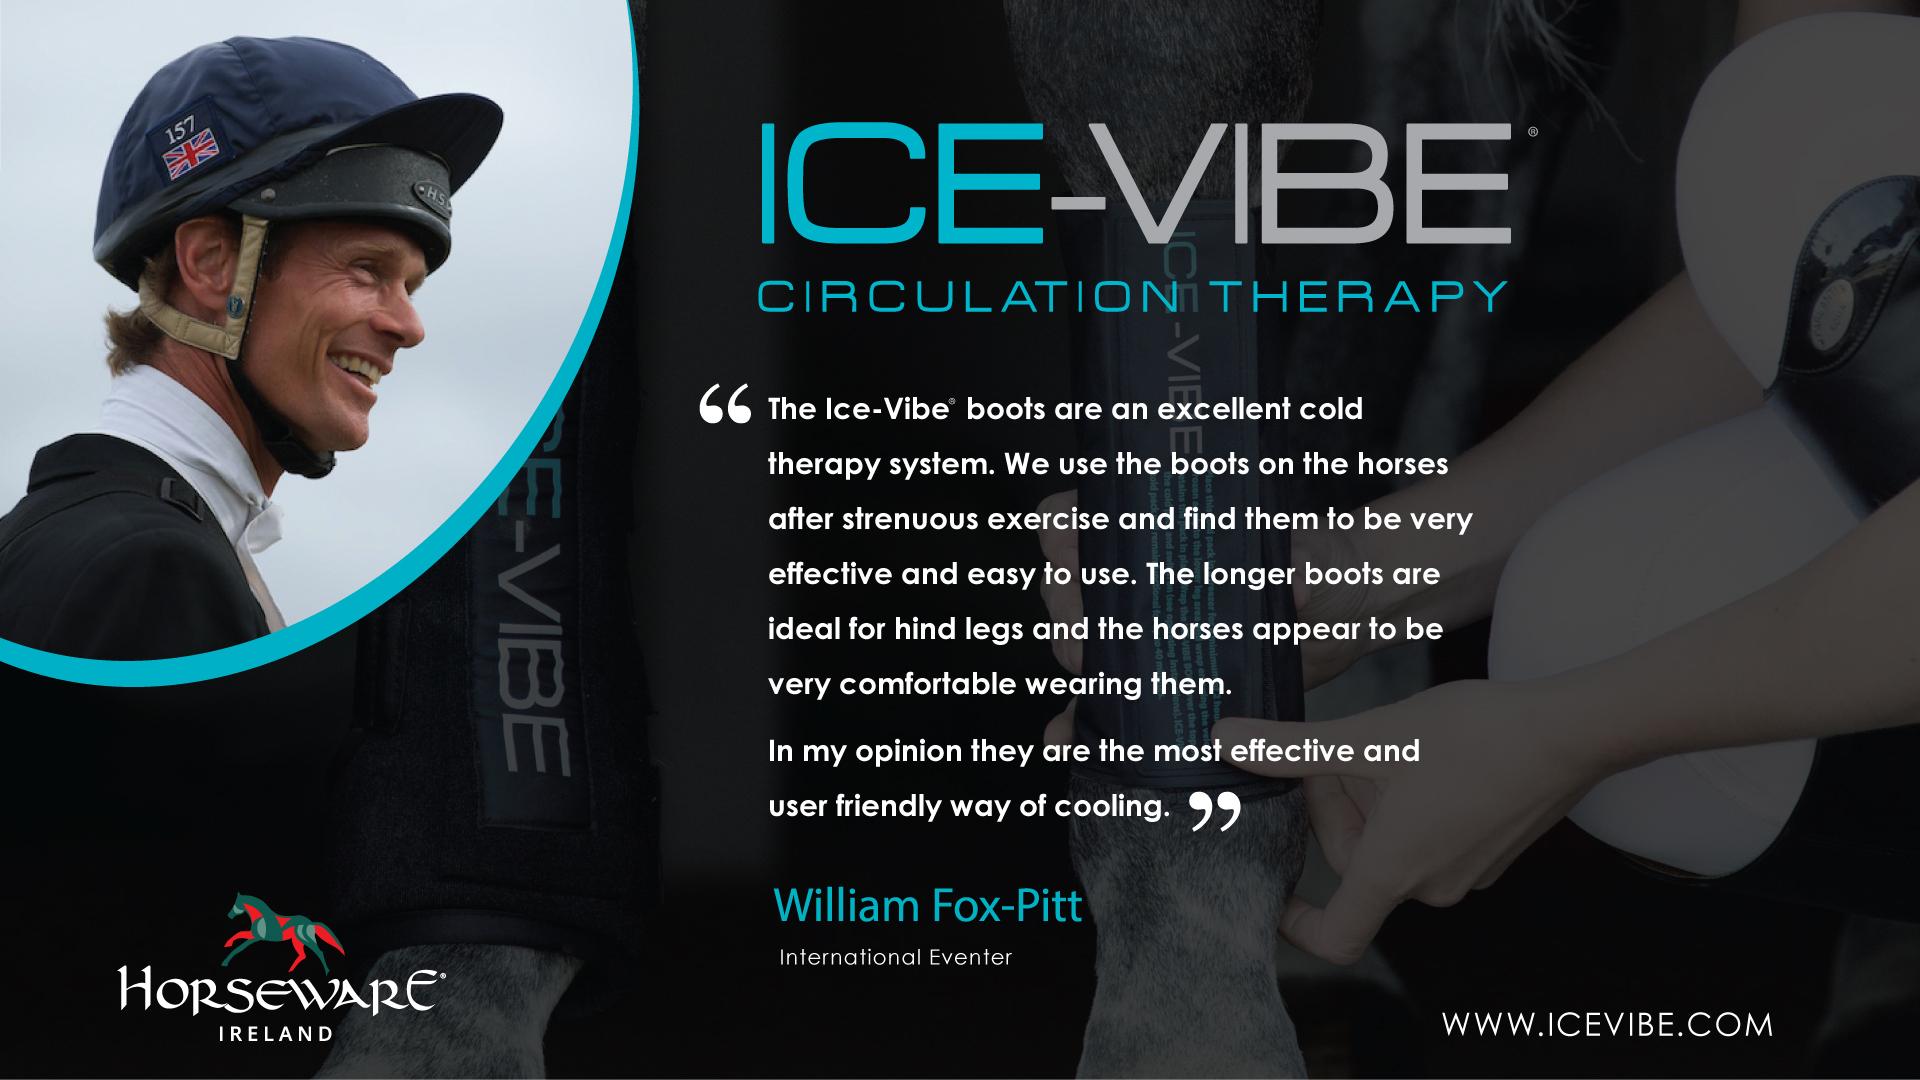 Horseware advertisement for Icevibe